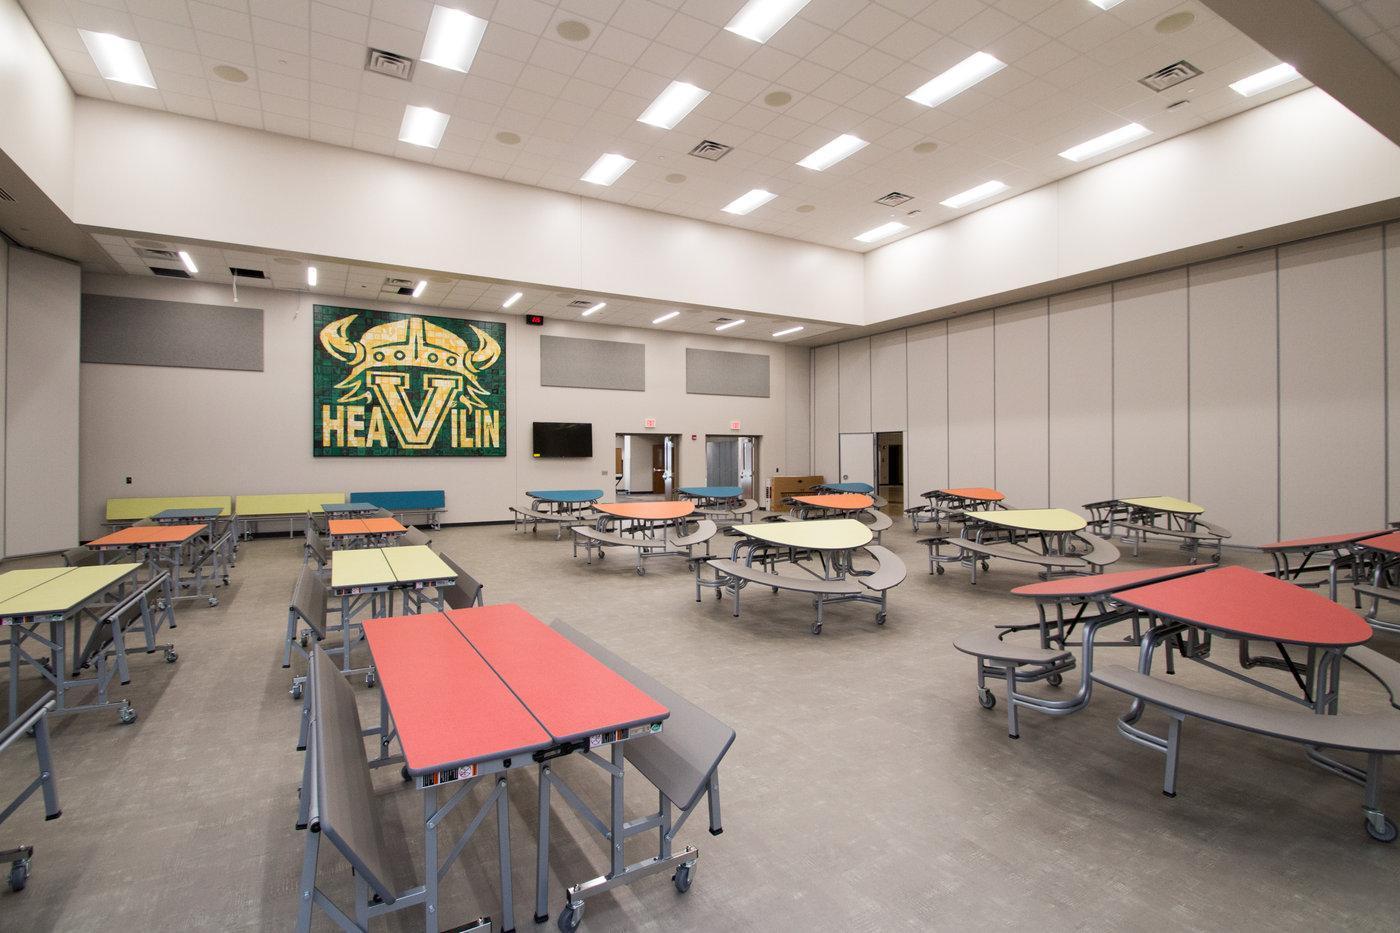 Heavilin Elementary School